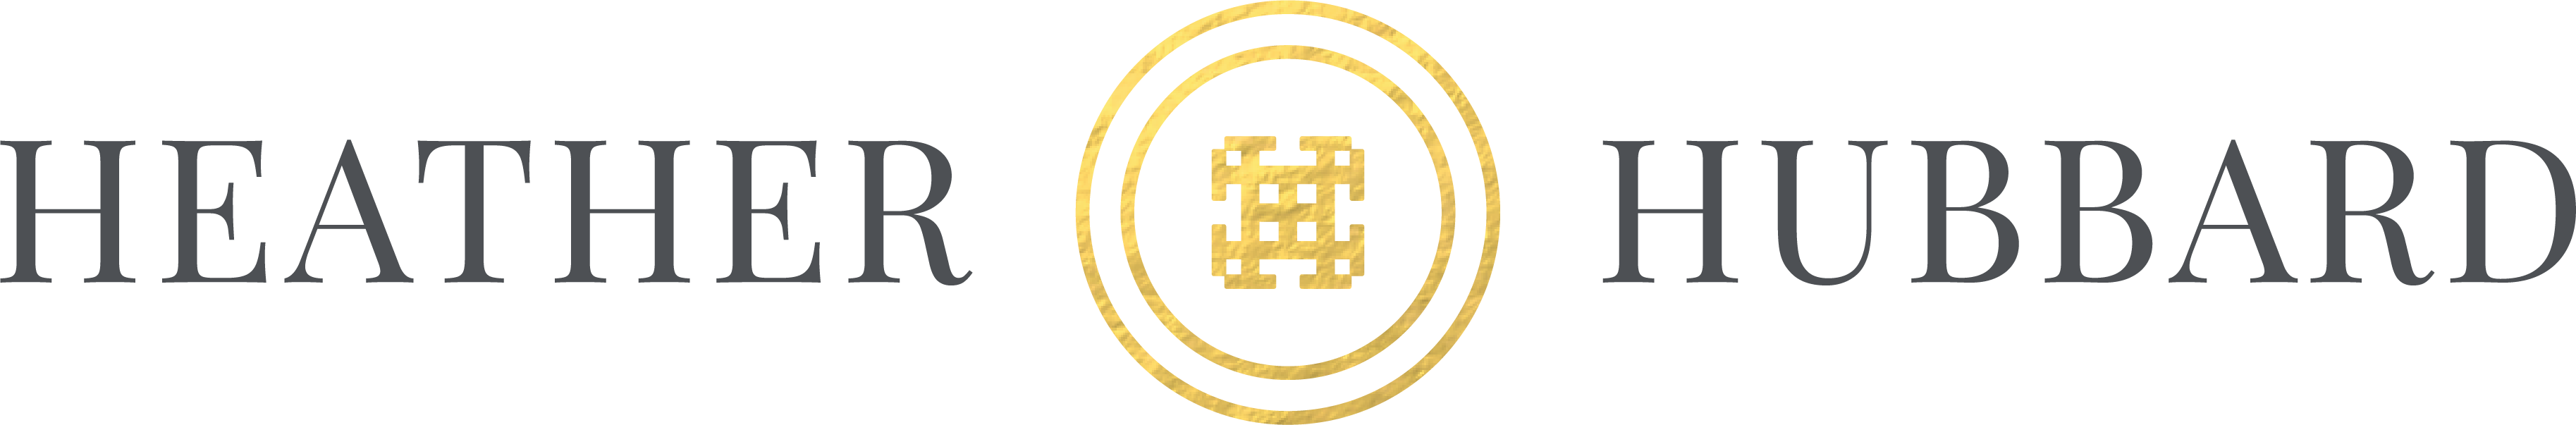 heather hubbard logo